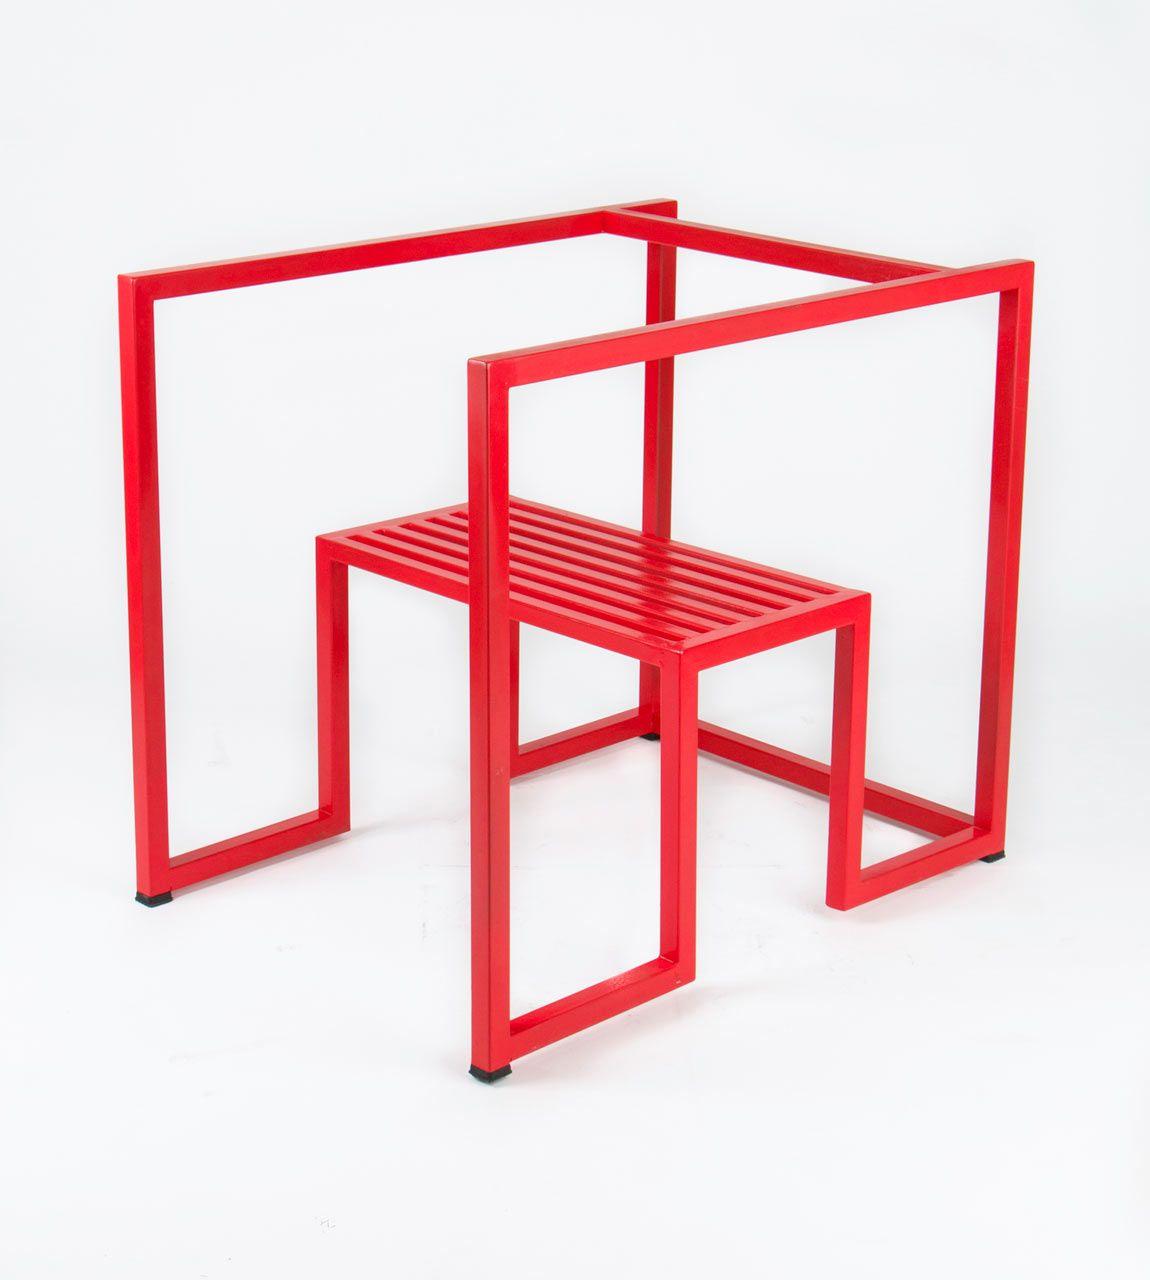 Bon A Stripped Down, Geometric Chair